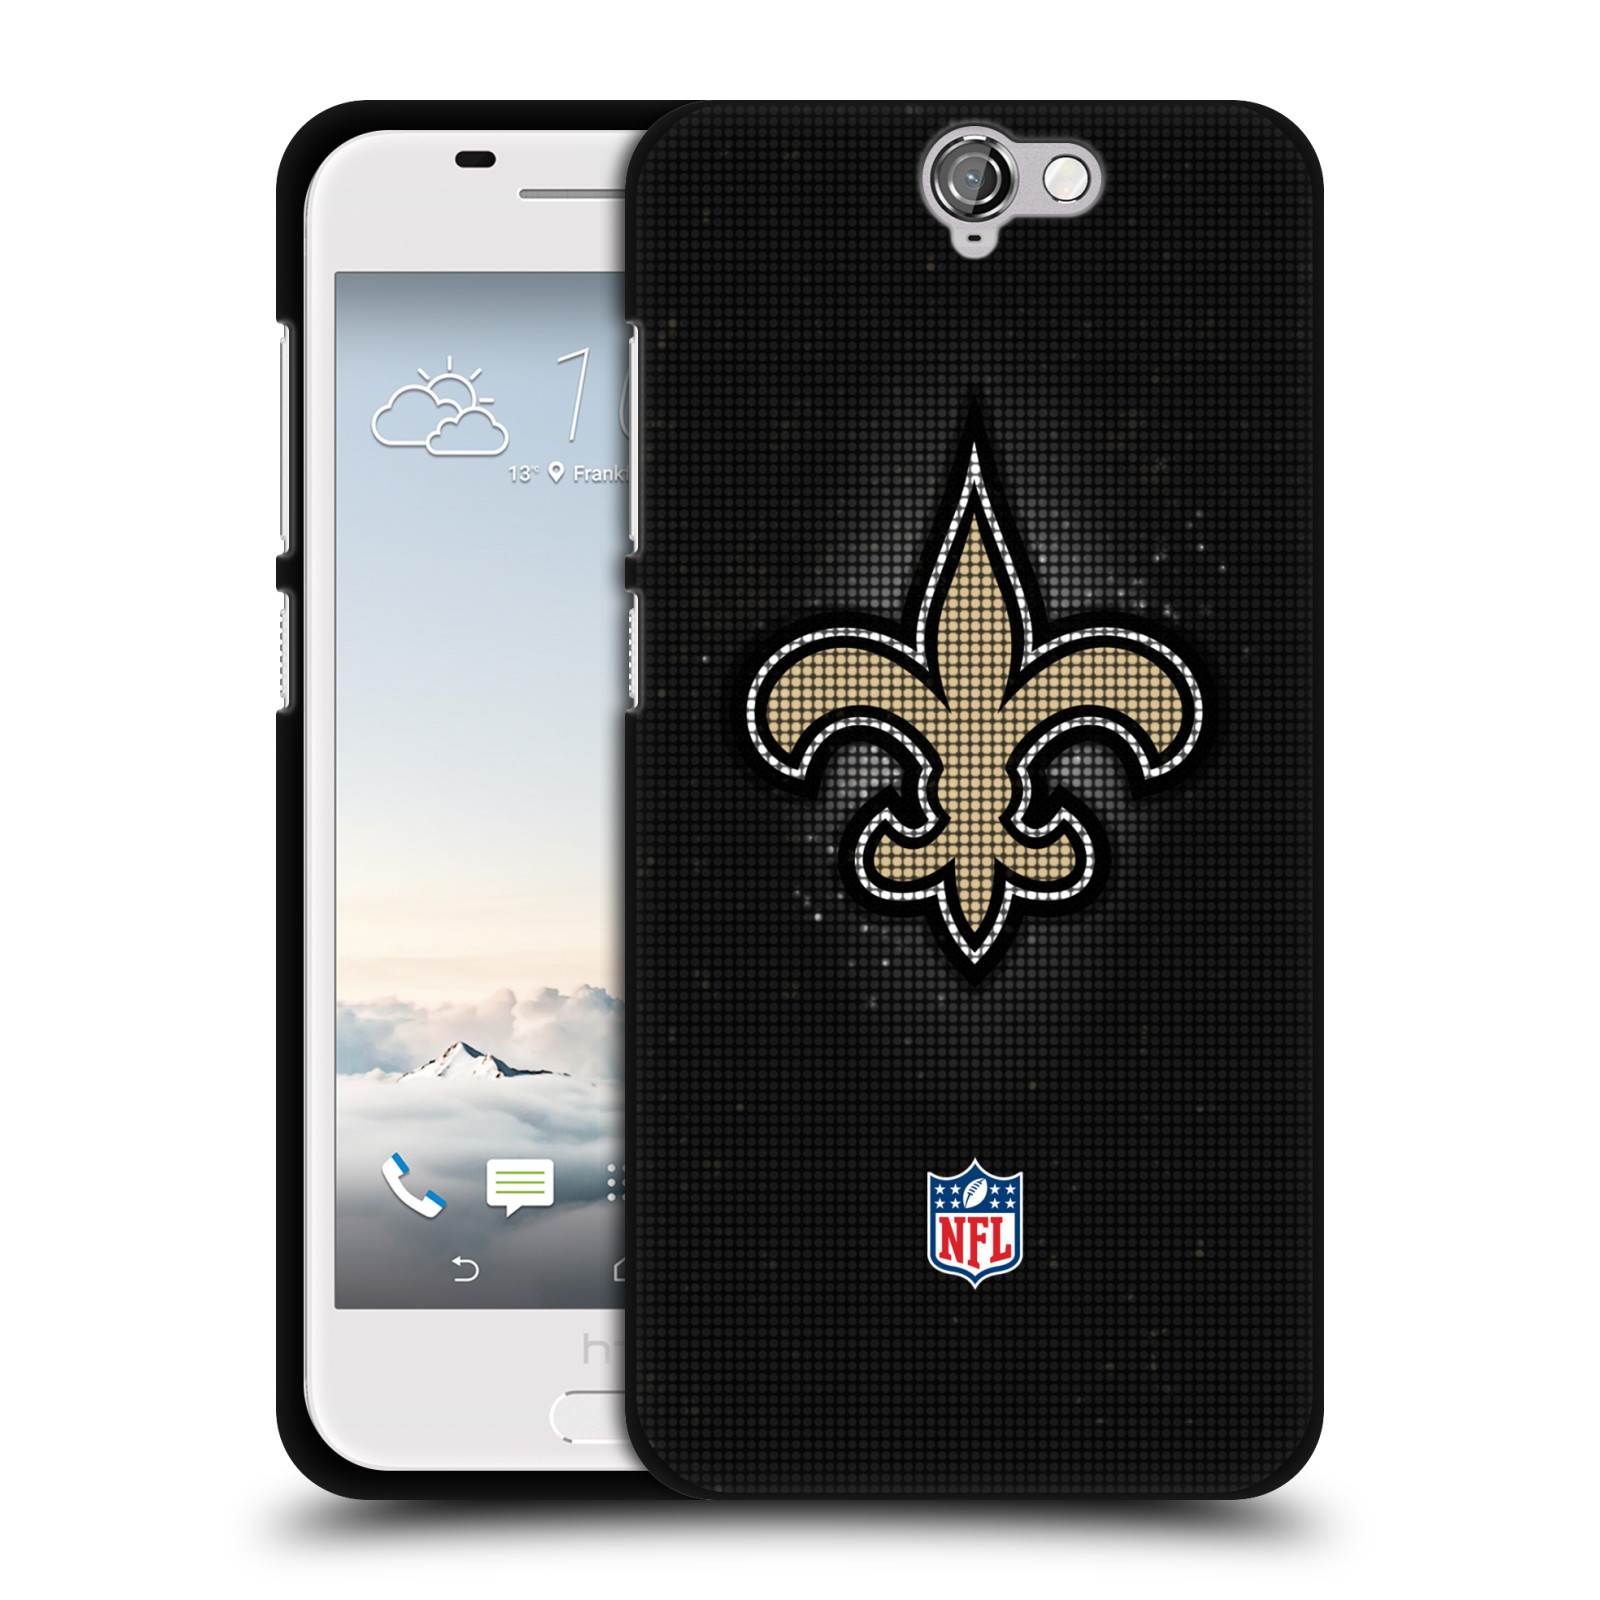 OFFICIAL-NFL-2017-18-NEW-ORLEANS-SAINTS-BLACK-SOFT-GEL-CASE-FOR-HTC-PHONES